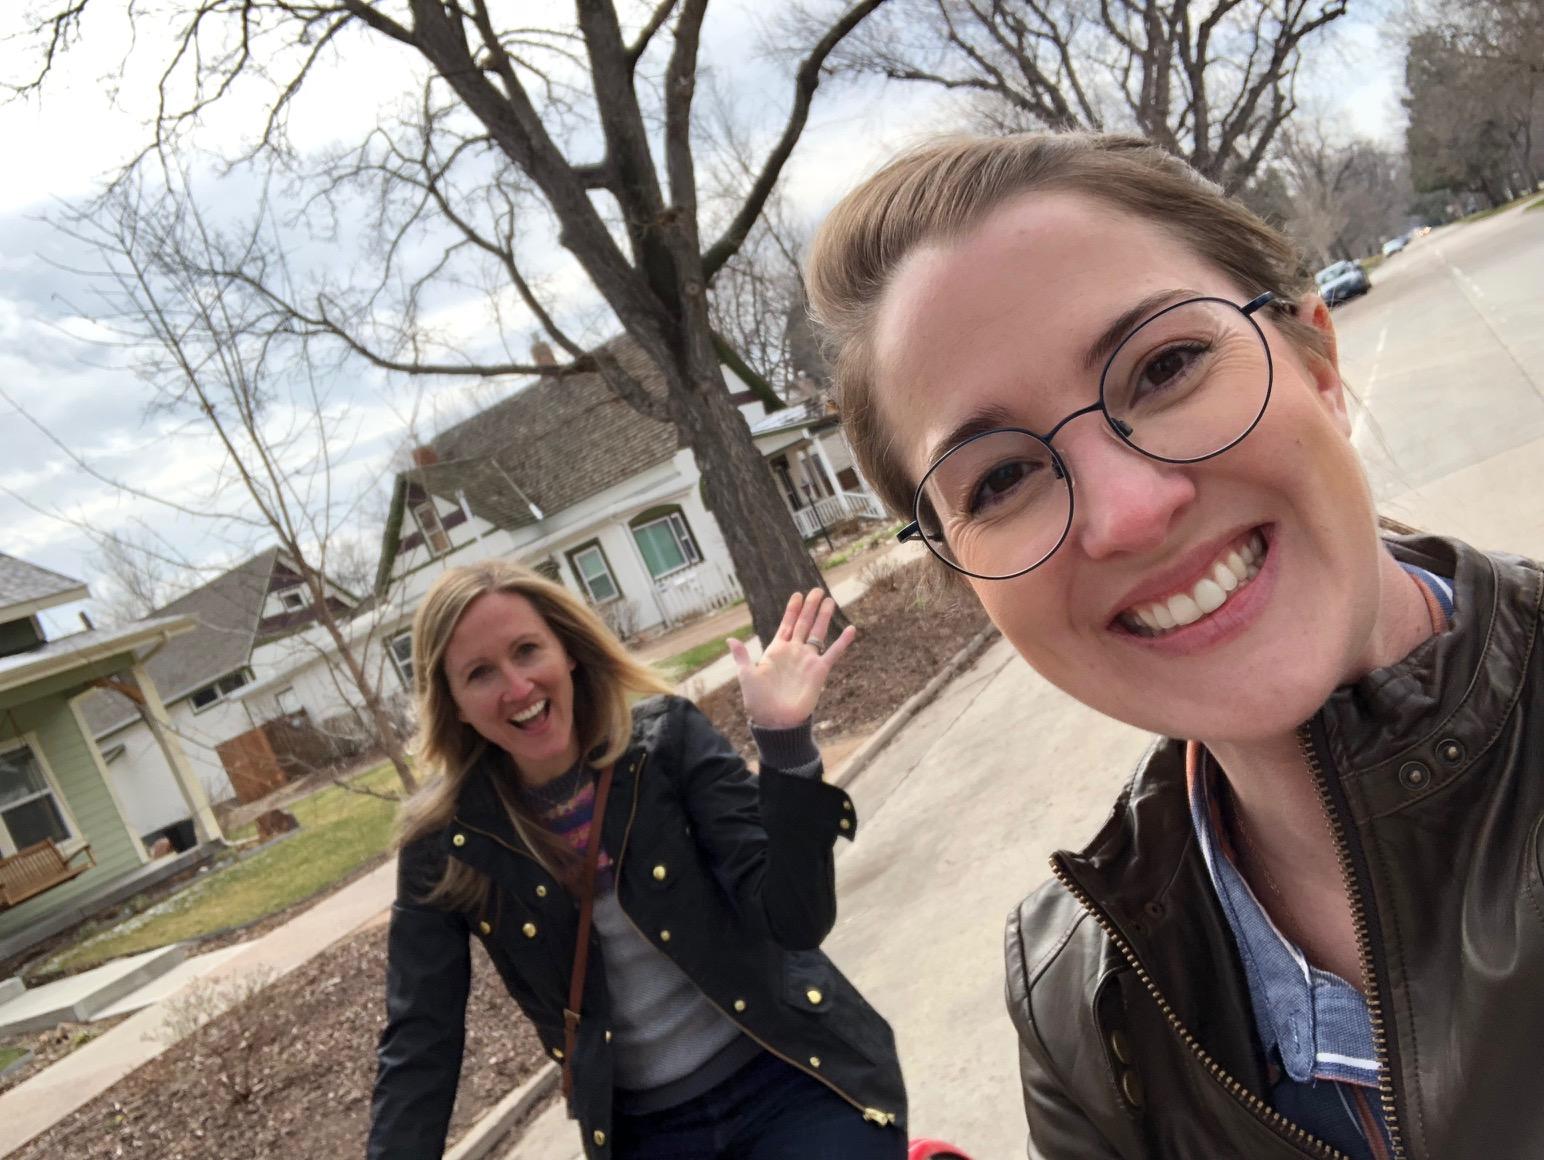 Biking around with my girl, Jamie.